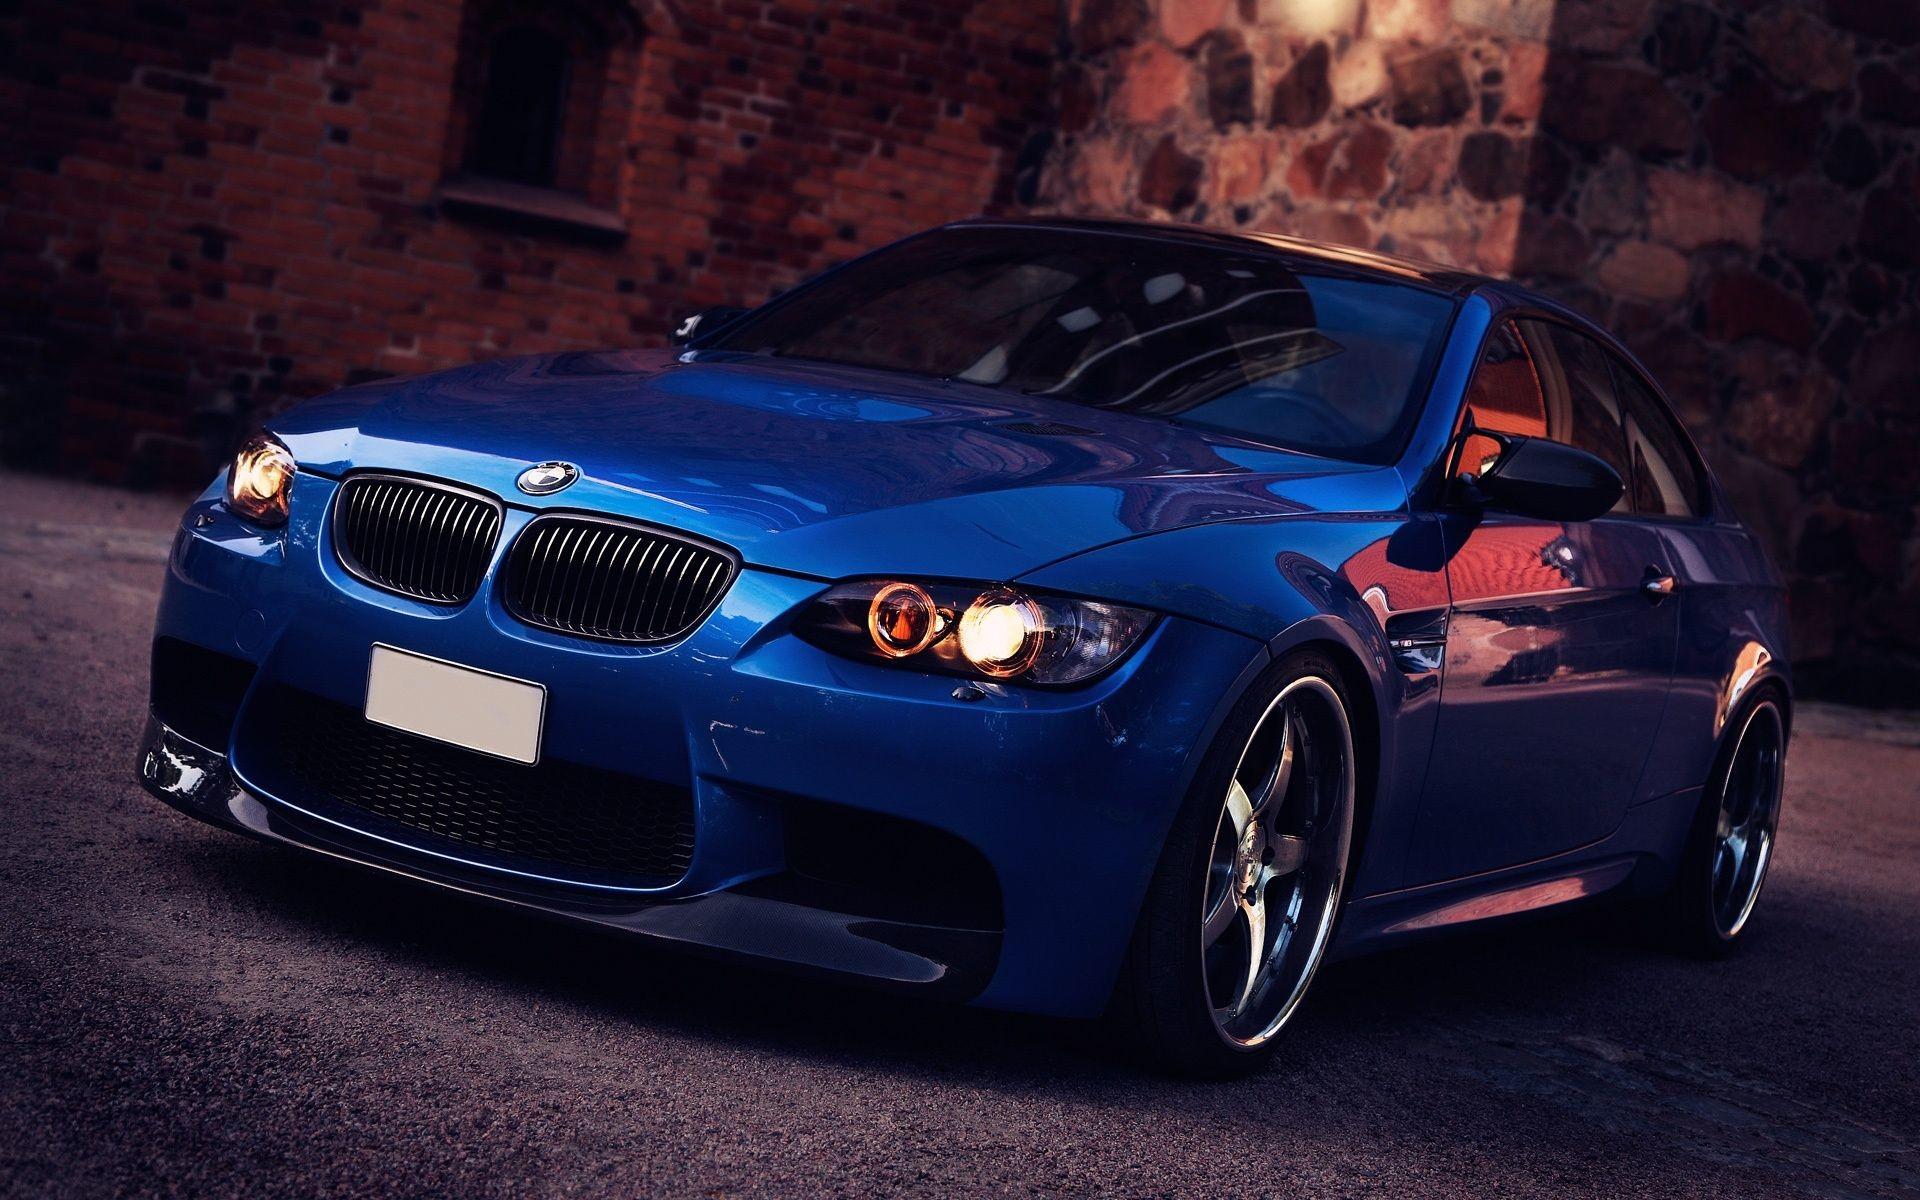 Free Blue Car Wallpaper 32615 px ~ HDWallSource.com